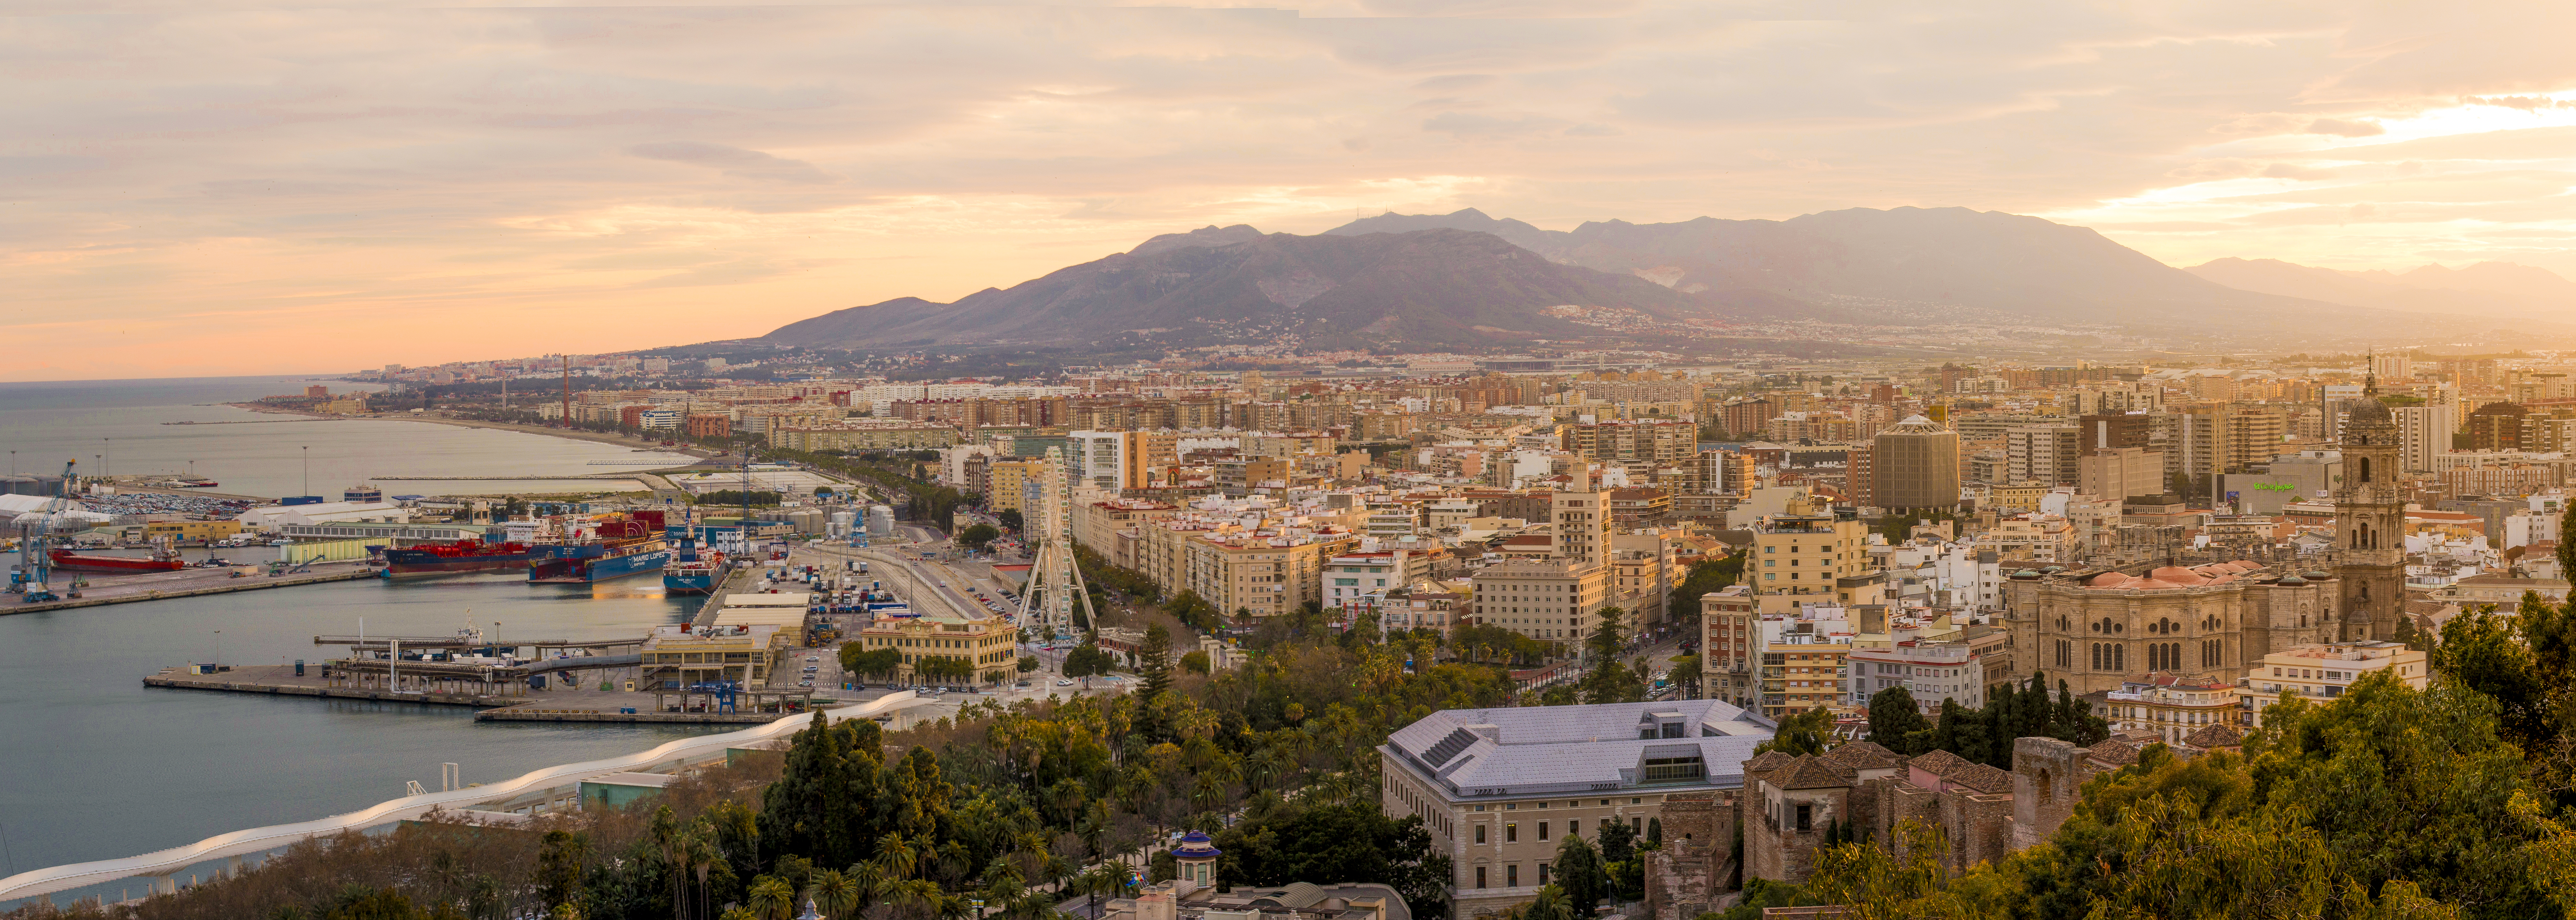 Mudarse a Málaga desde Madrid